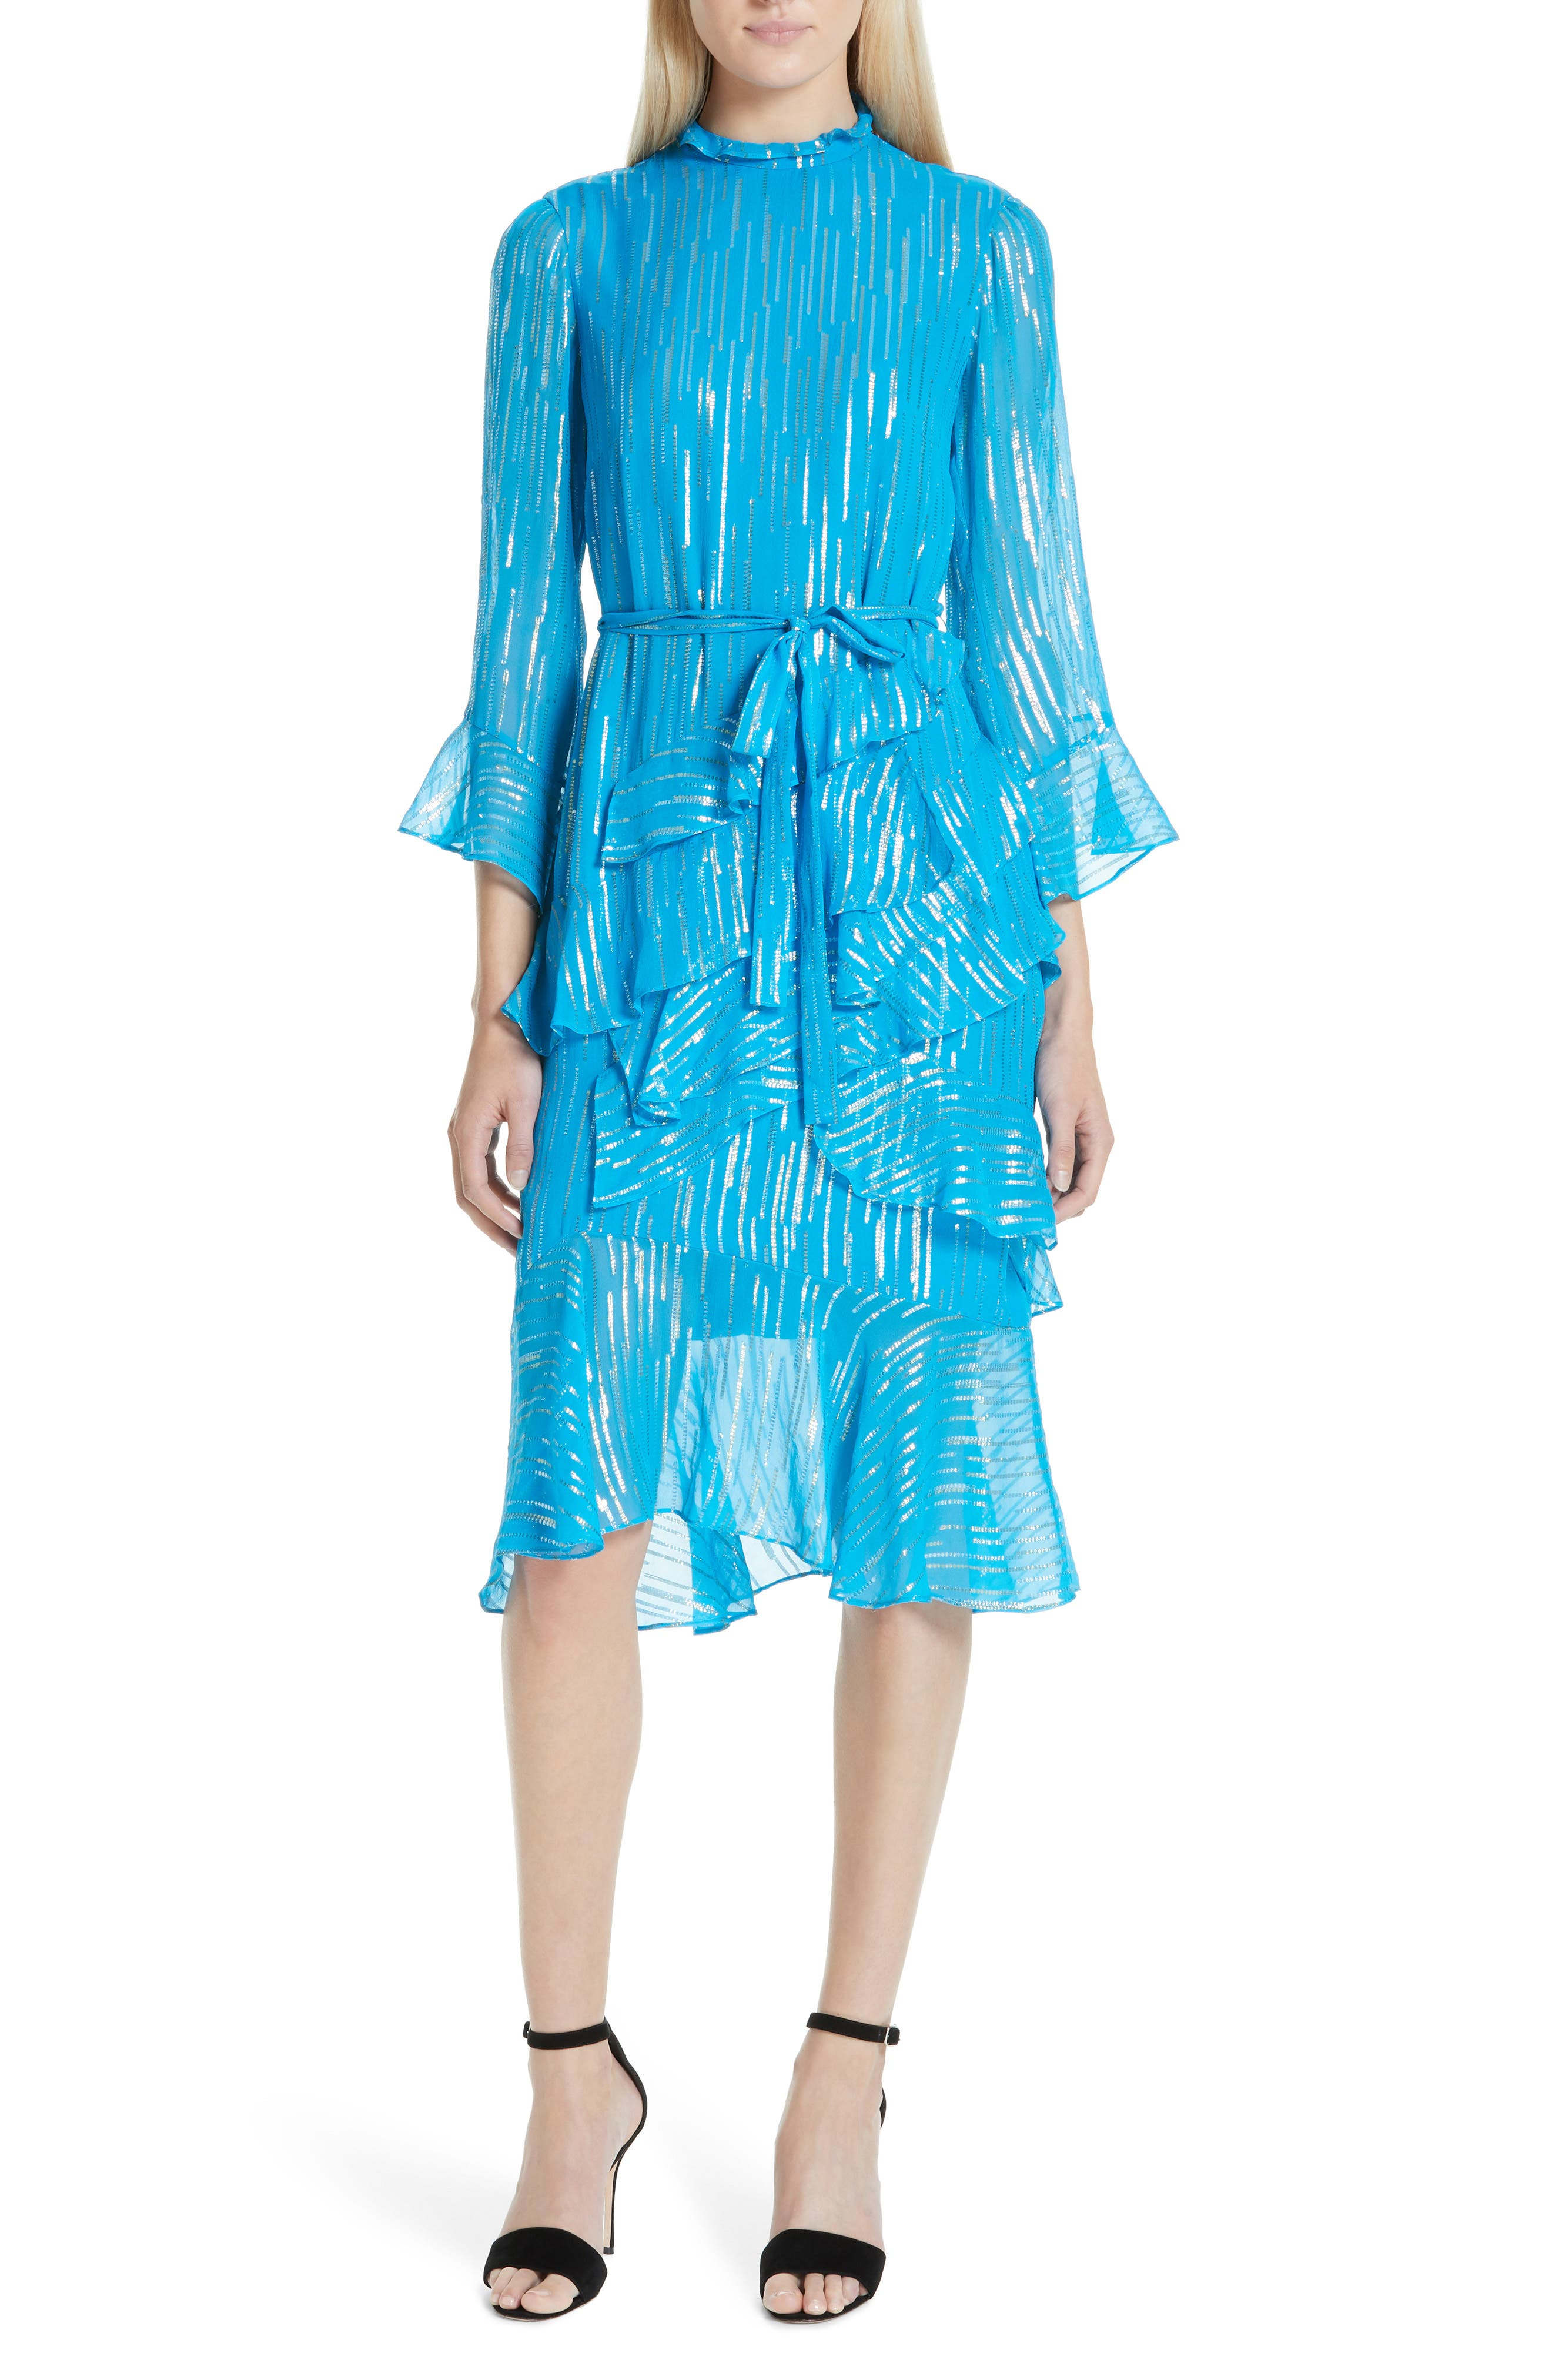 SALONI Marissa Metallic Ruffle Dress, Main, color, TURQUOISE/ METALLIC